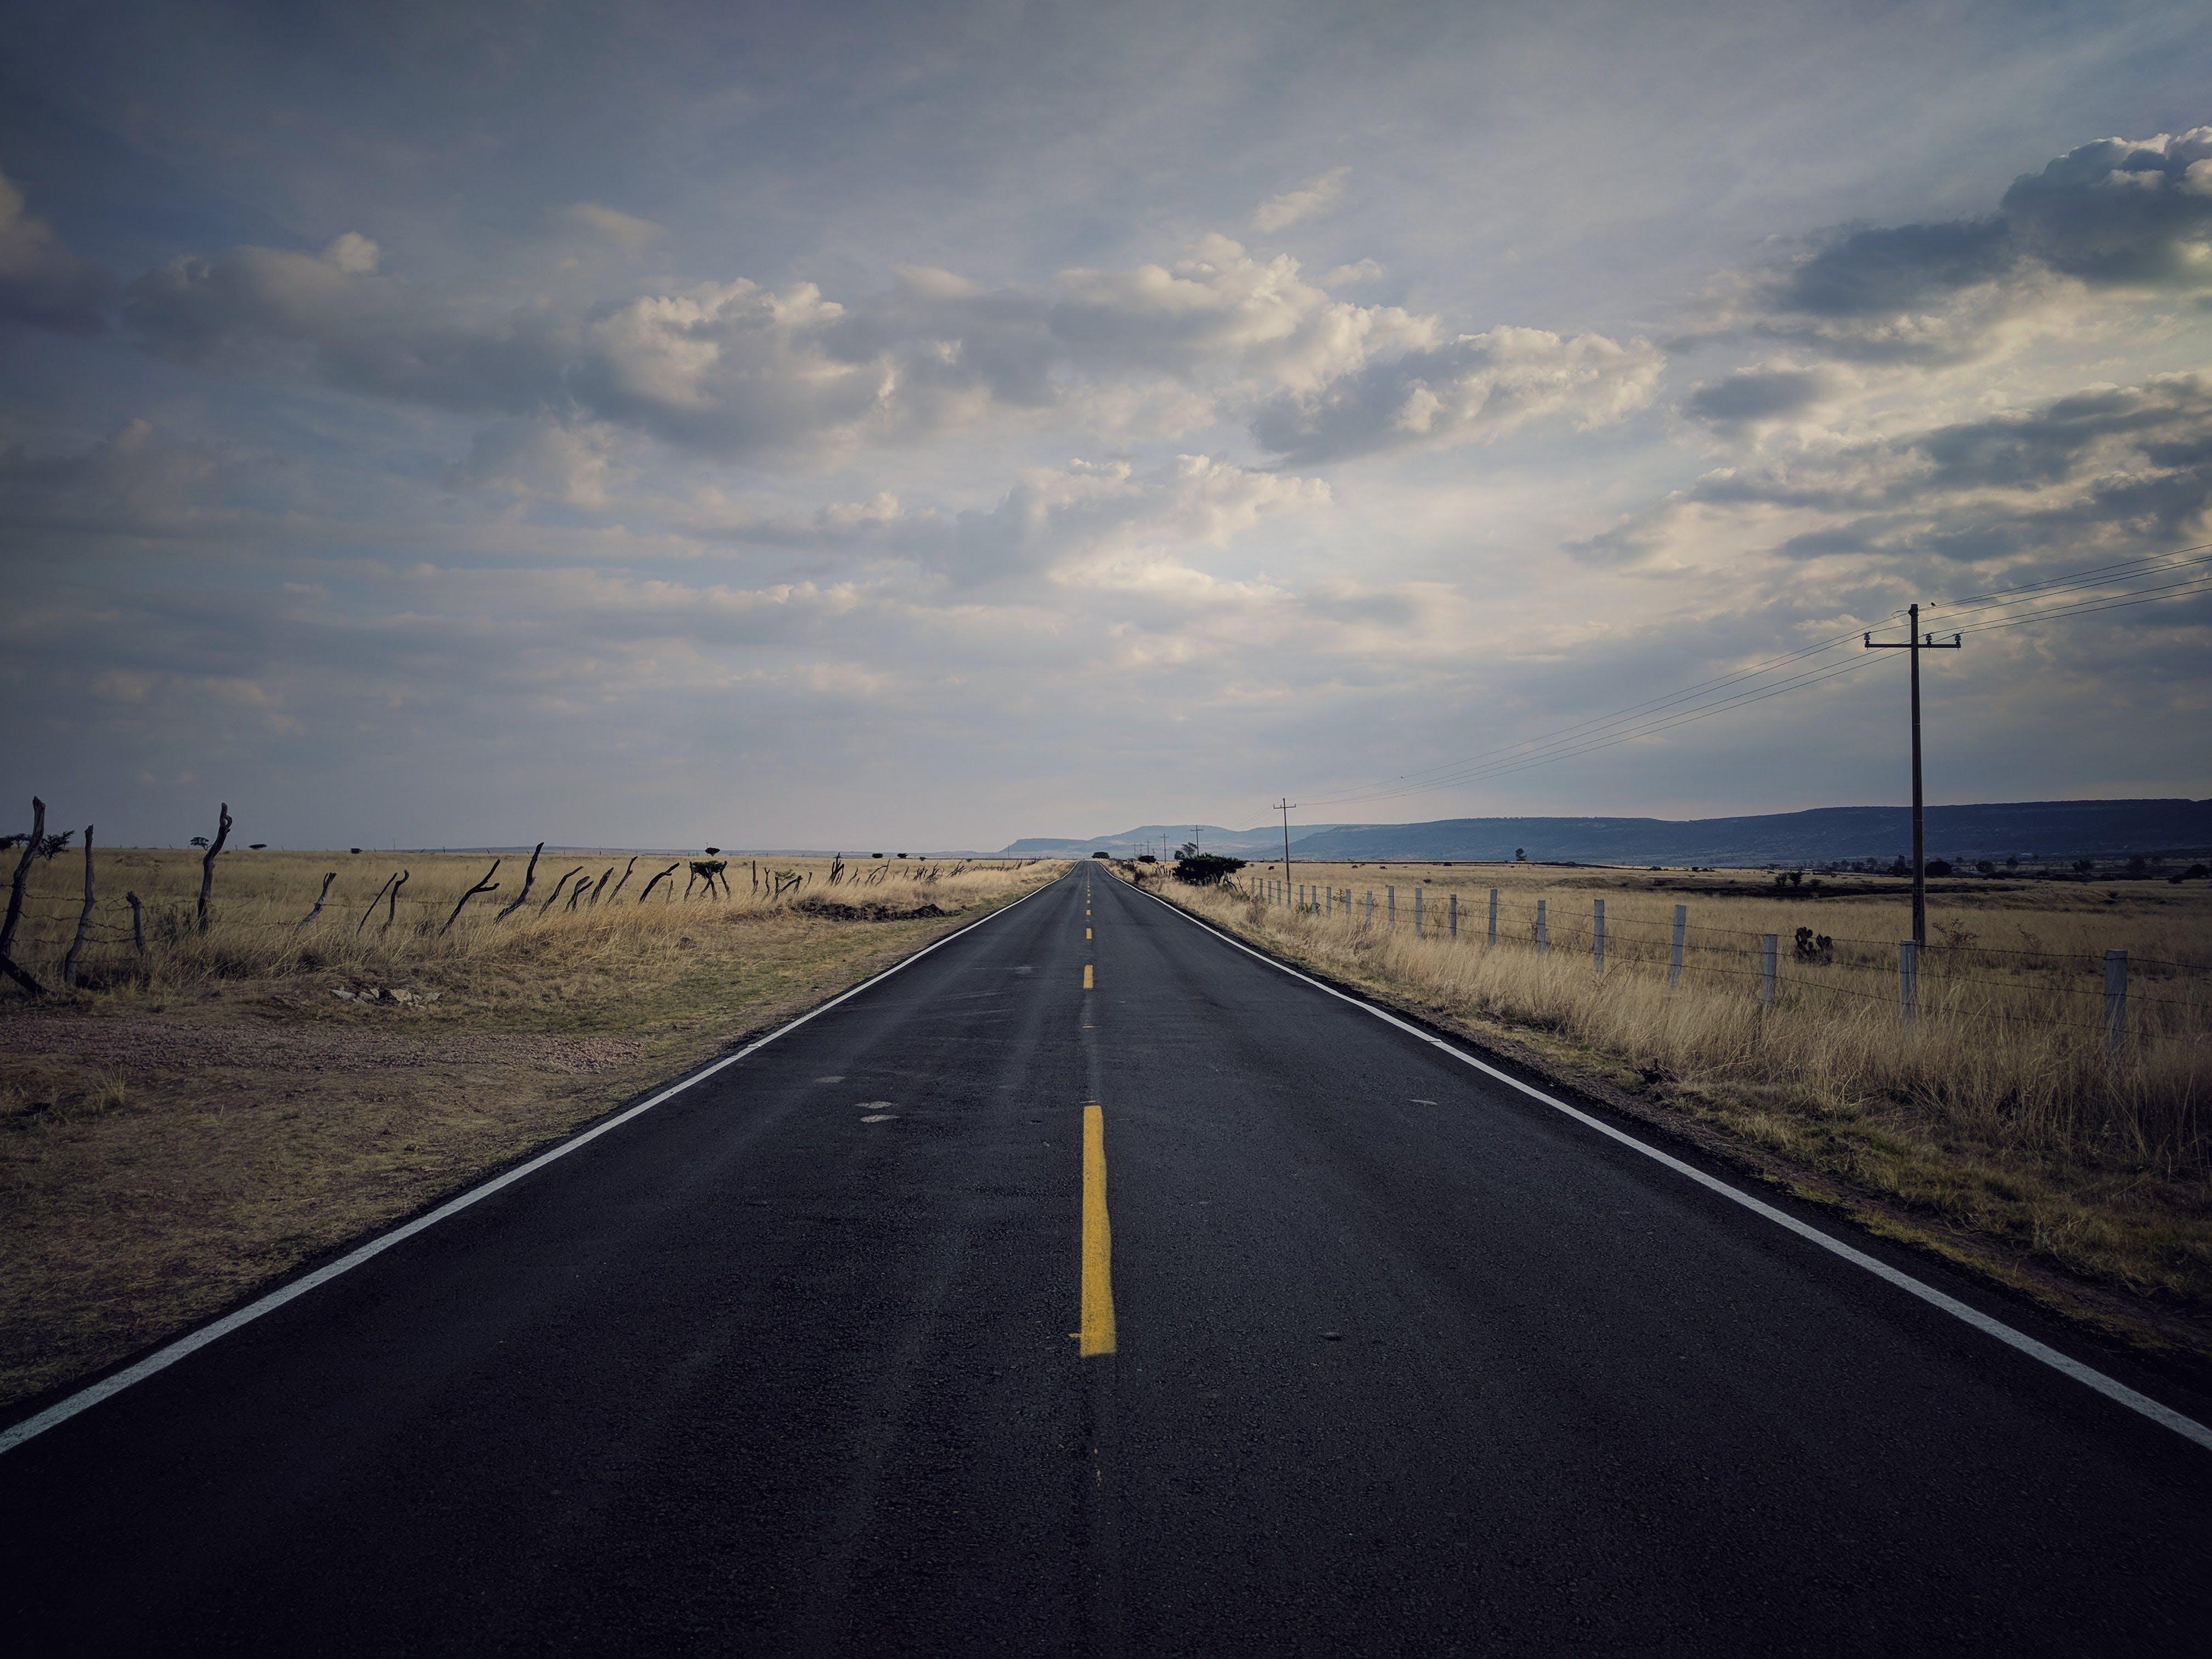 Landscape Photography of Pavement Road